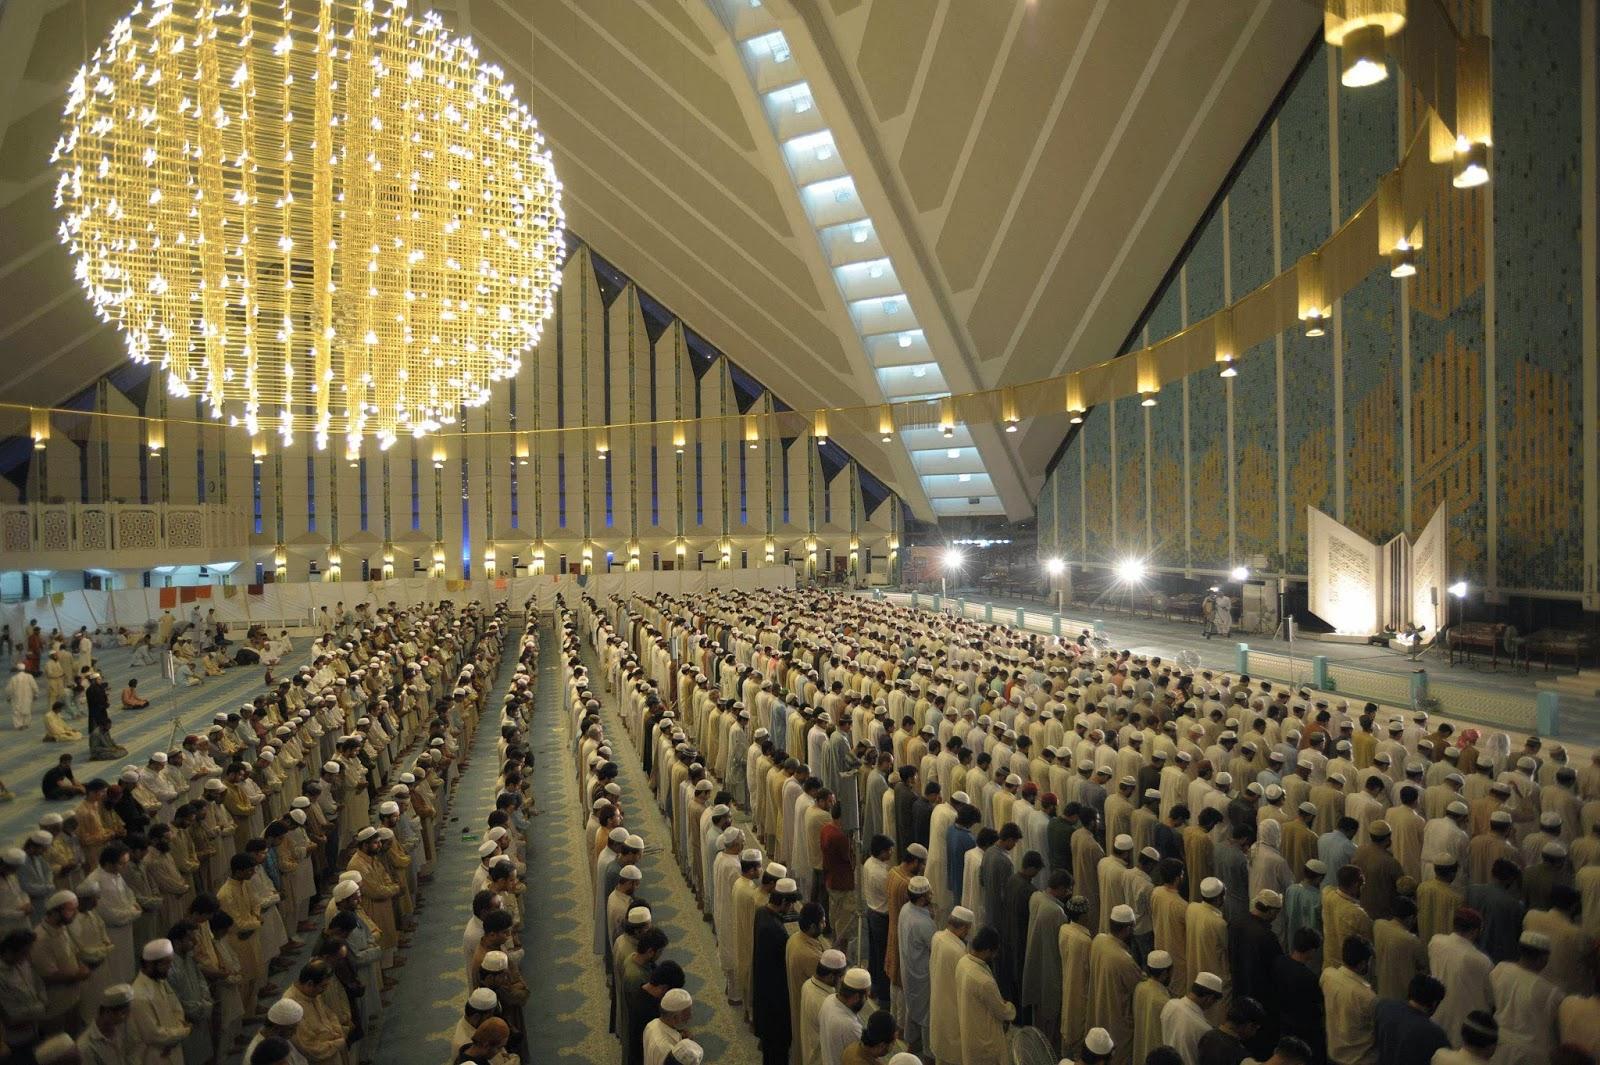 Tata Cara Shalat Tarawih | Bacaan Doa Sholat Tarawih